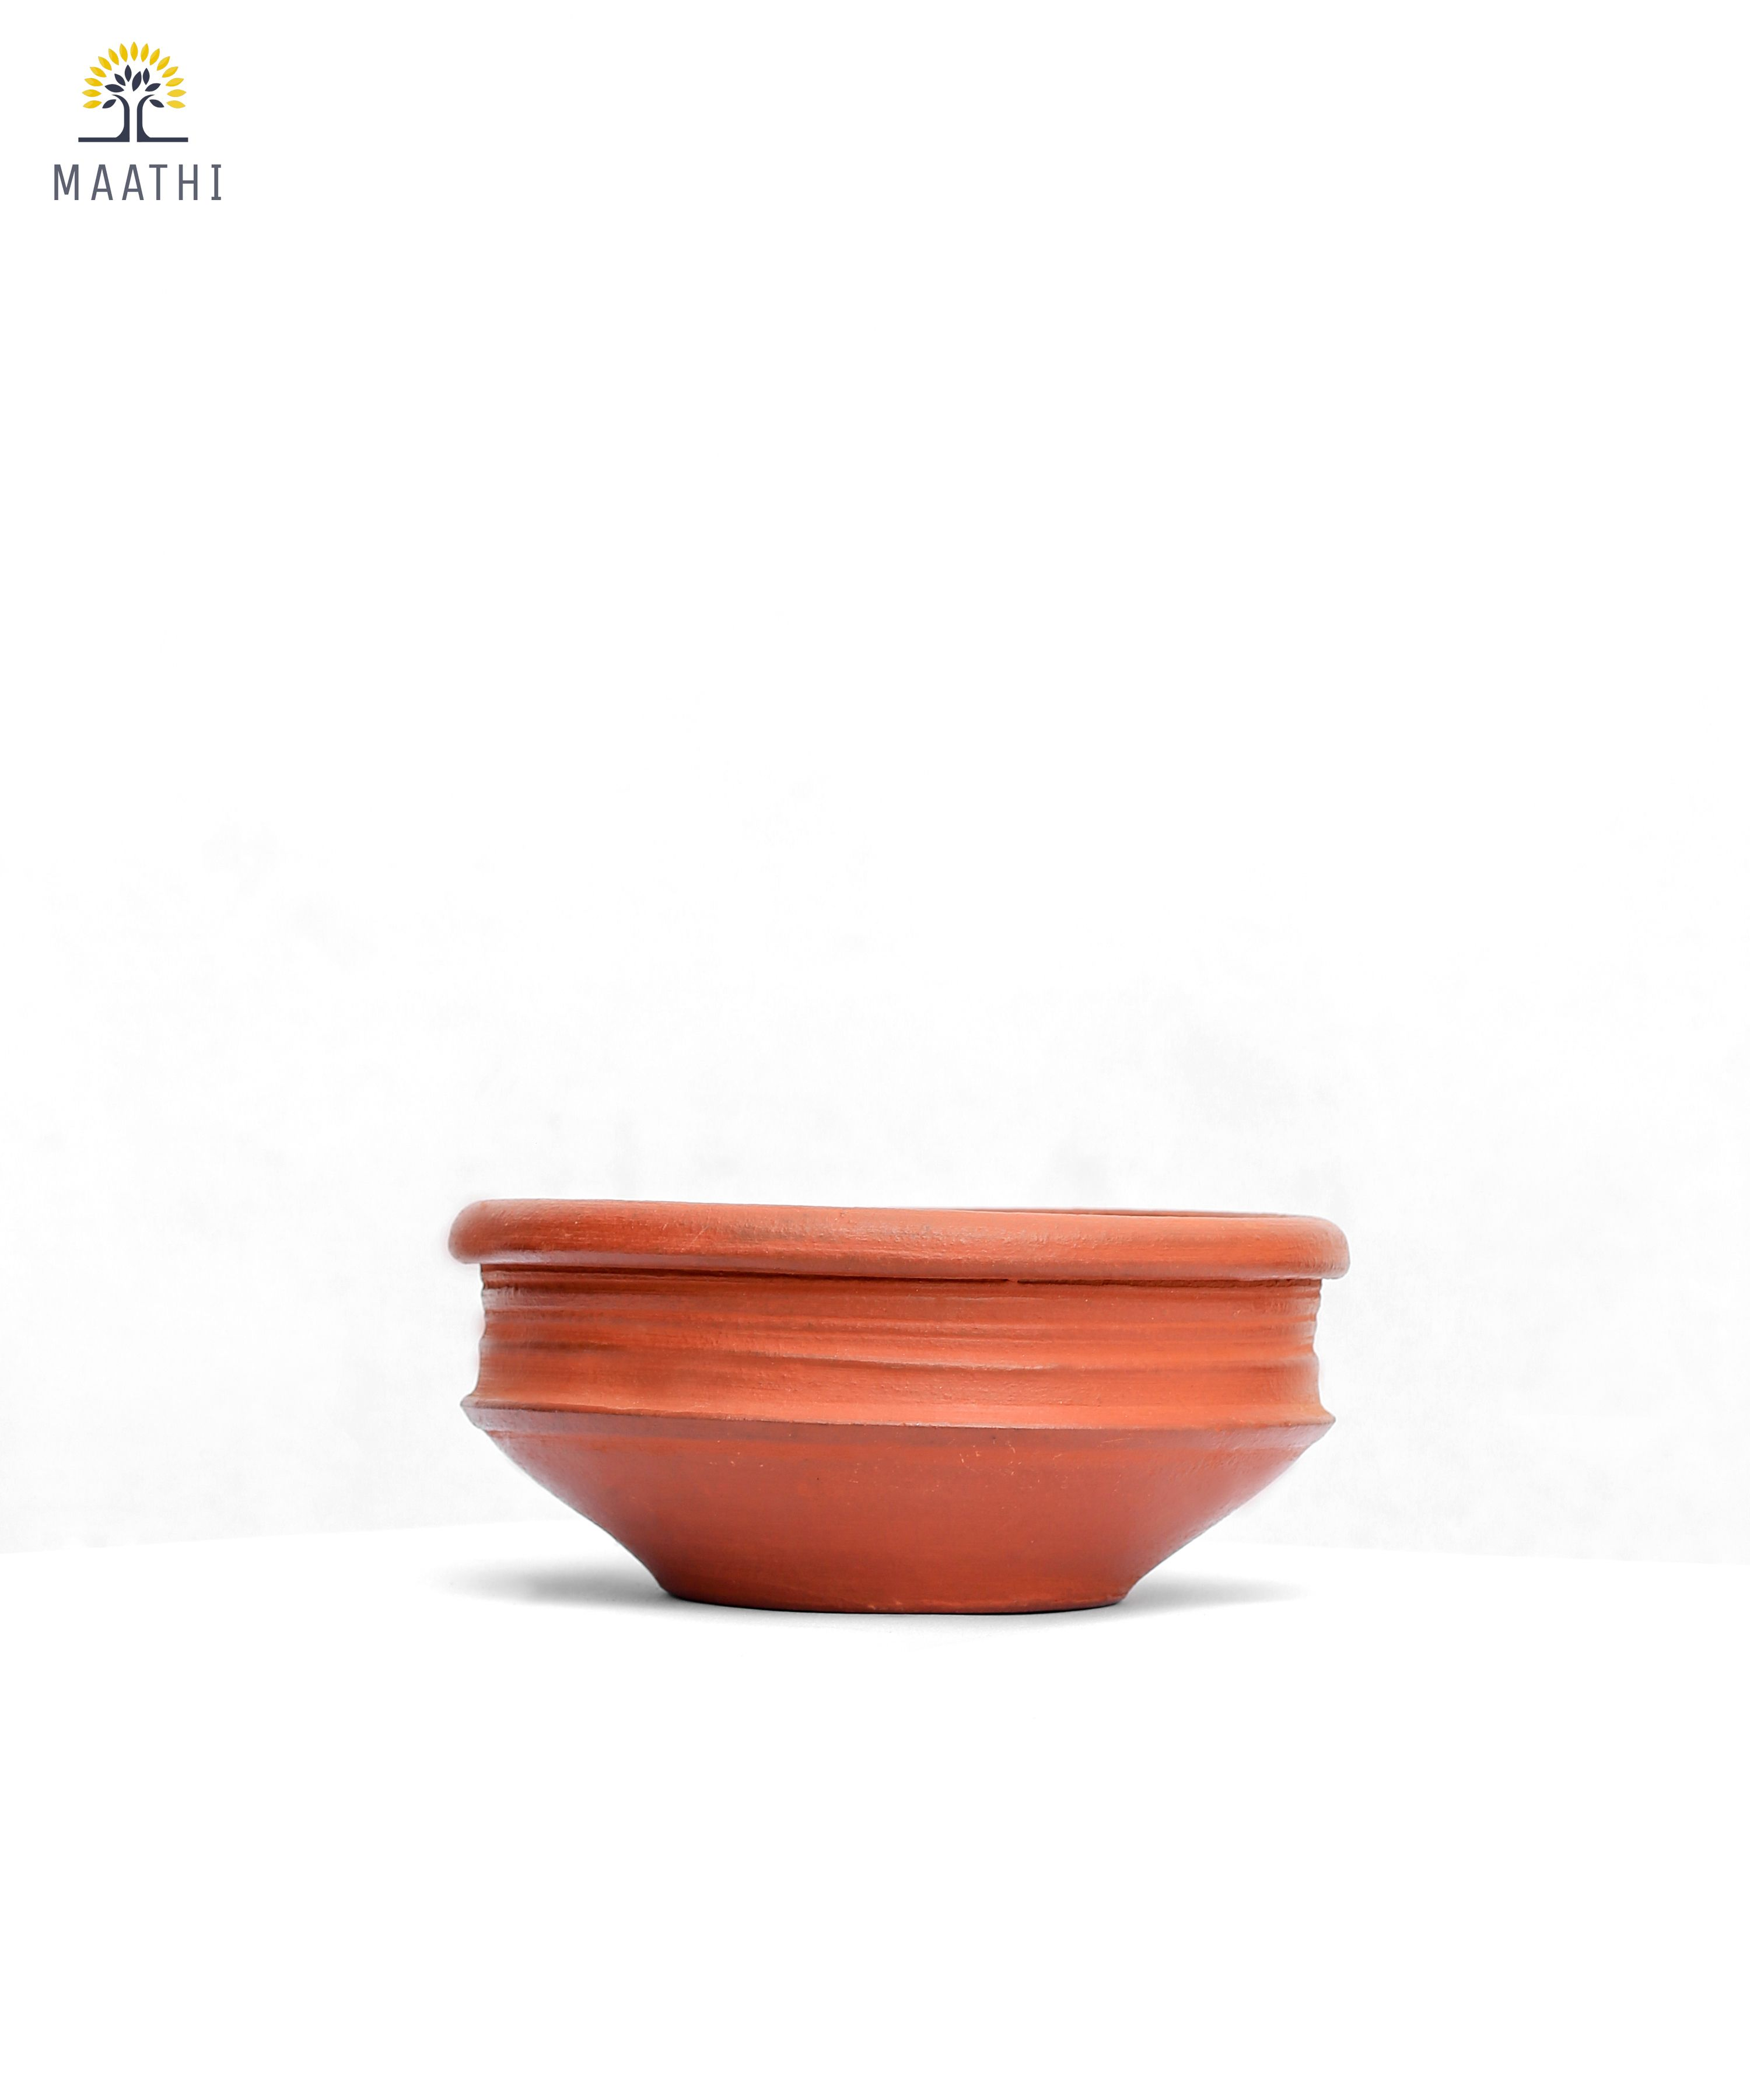 Terracotta Serving Bowl In 2020 Serving Bowls Terracotta Bowl